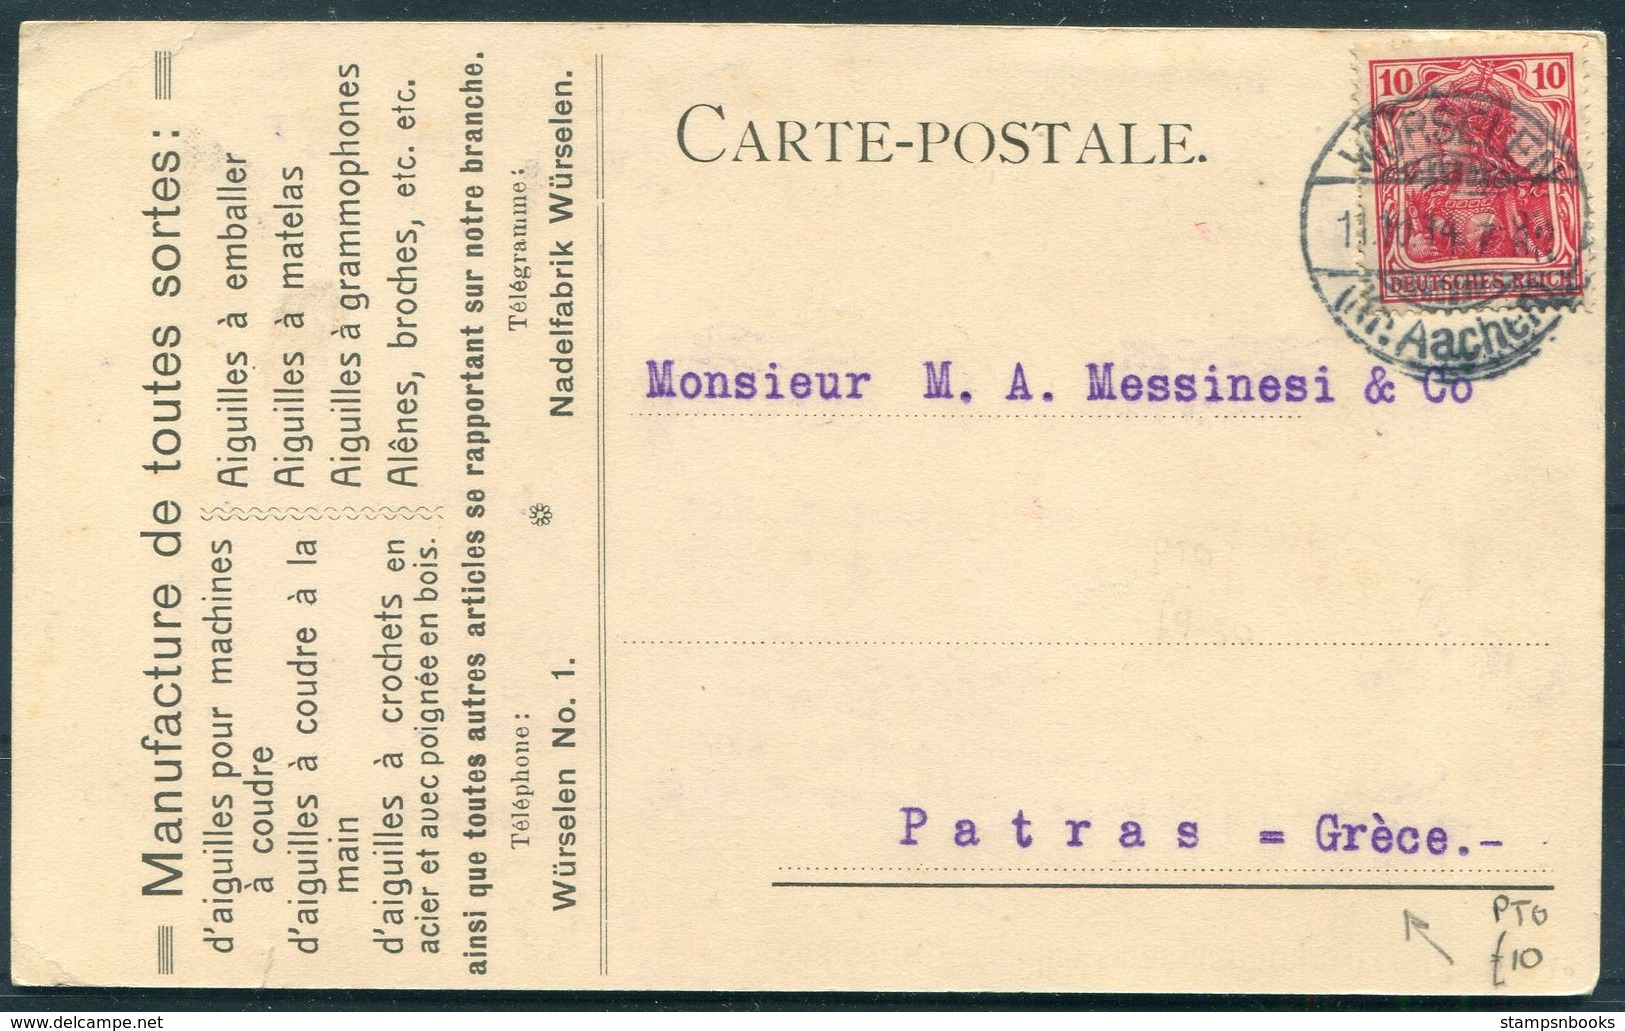 1914 Germany Queck Freres Illustrated Advertising Postcard Wurselen - Patras Greece - Briefe U. Dokumente